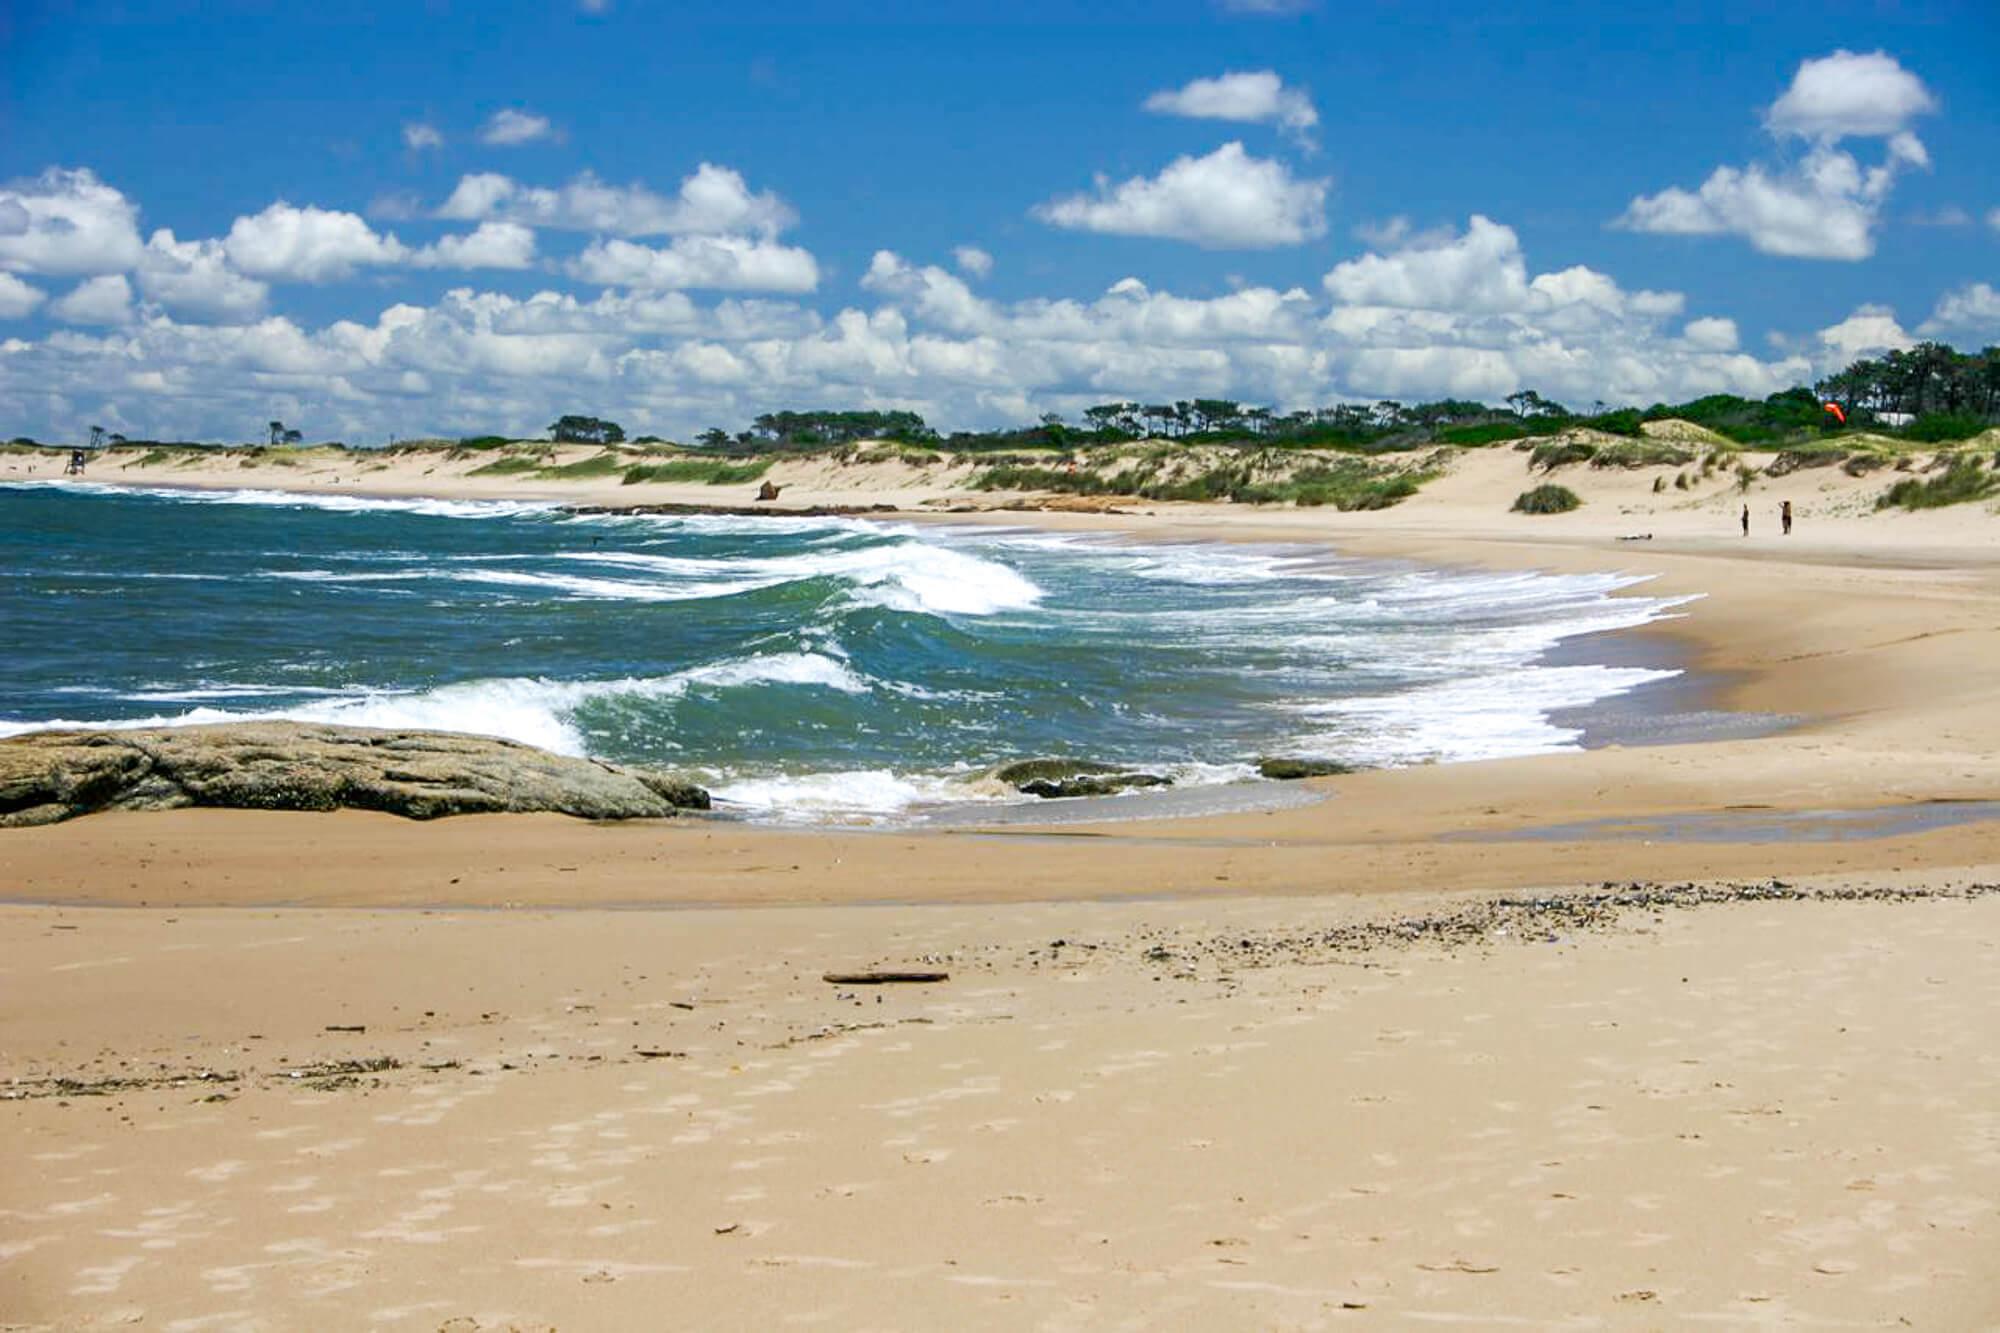 Waves on Playa Mansa